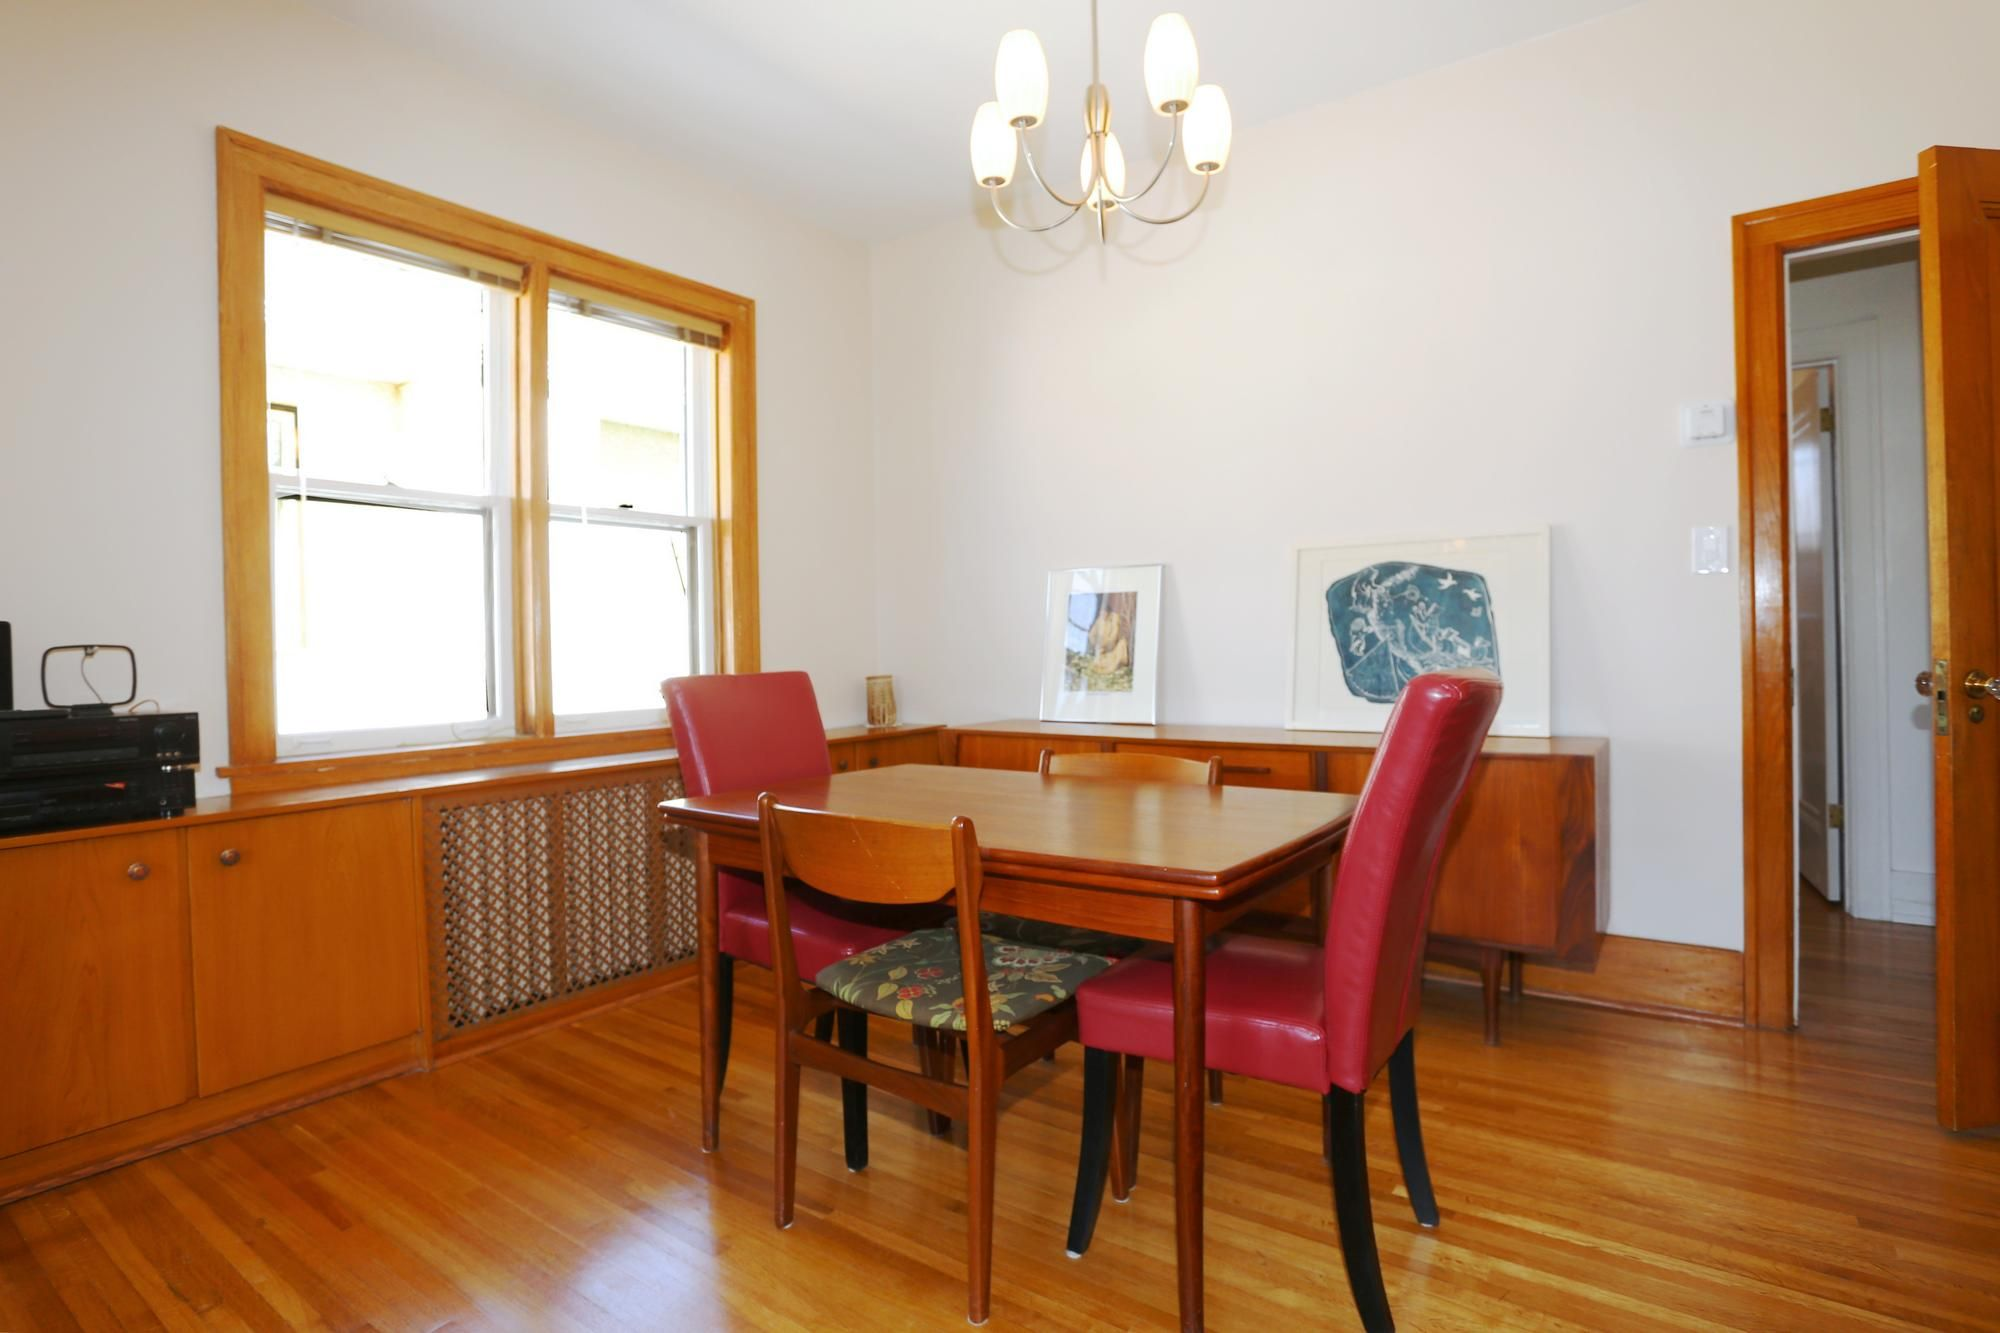 Photo 8: Photos: 109 Garfield Street South in Winnipeg: Wolseley Single Family Detached for sale (5B)  : MLS®# 1808340